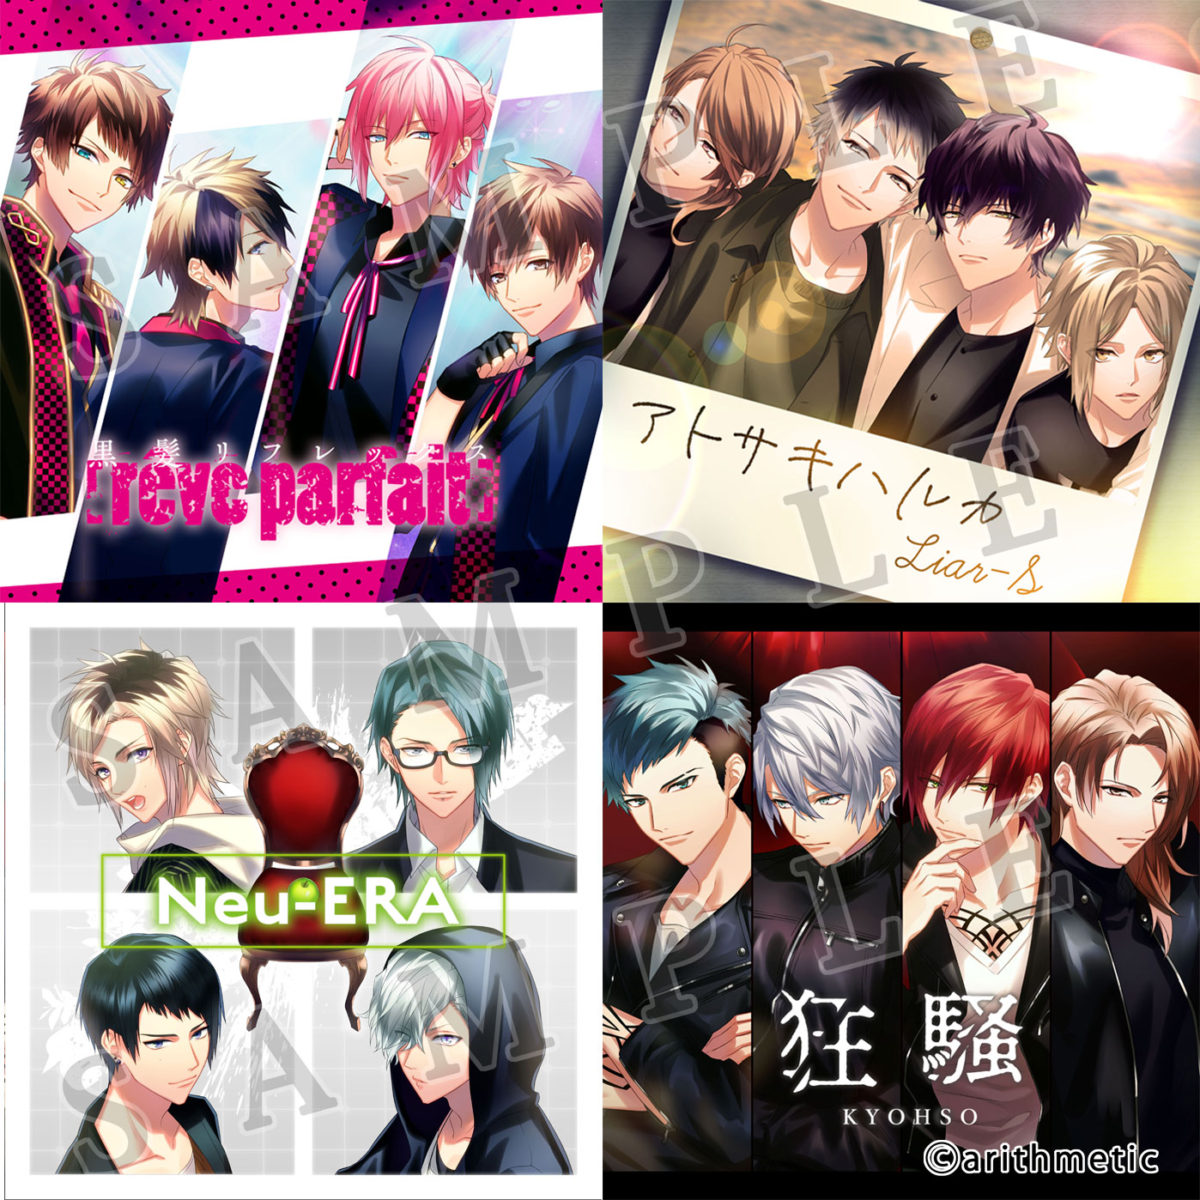 [rêve parfait]・Liar-S・KYOHSO・apple-polisher 新曲シングルCDが2月17日(水)4作同時リリース決定!